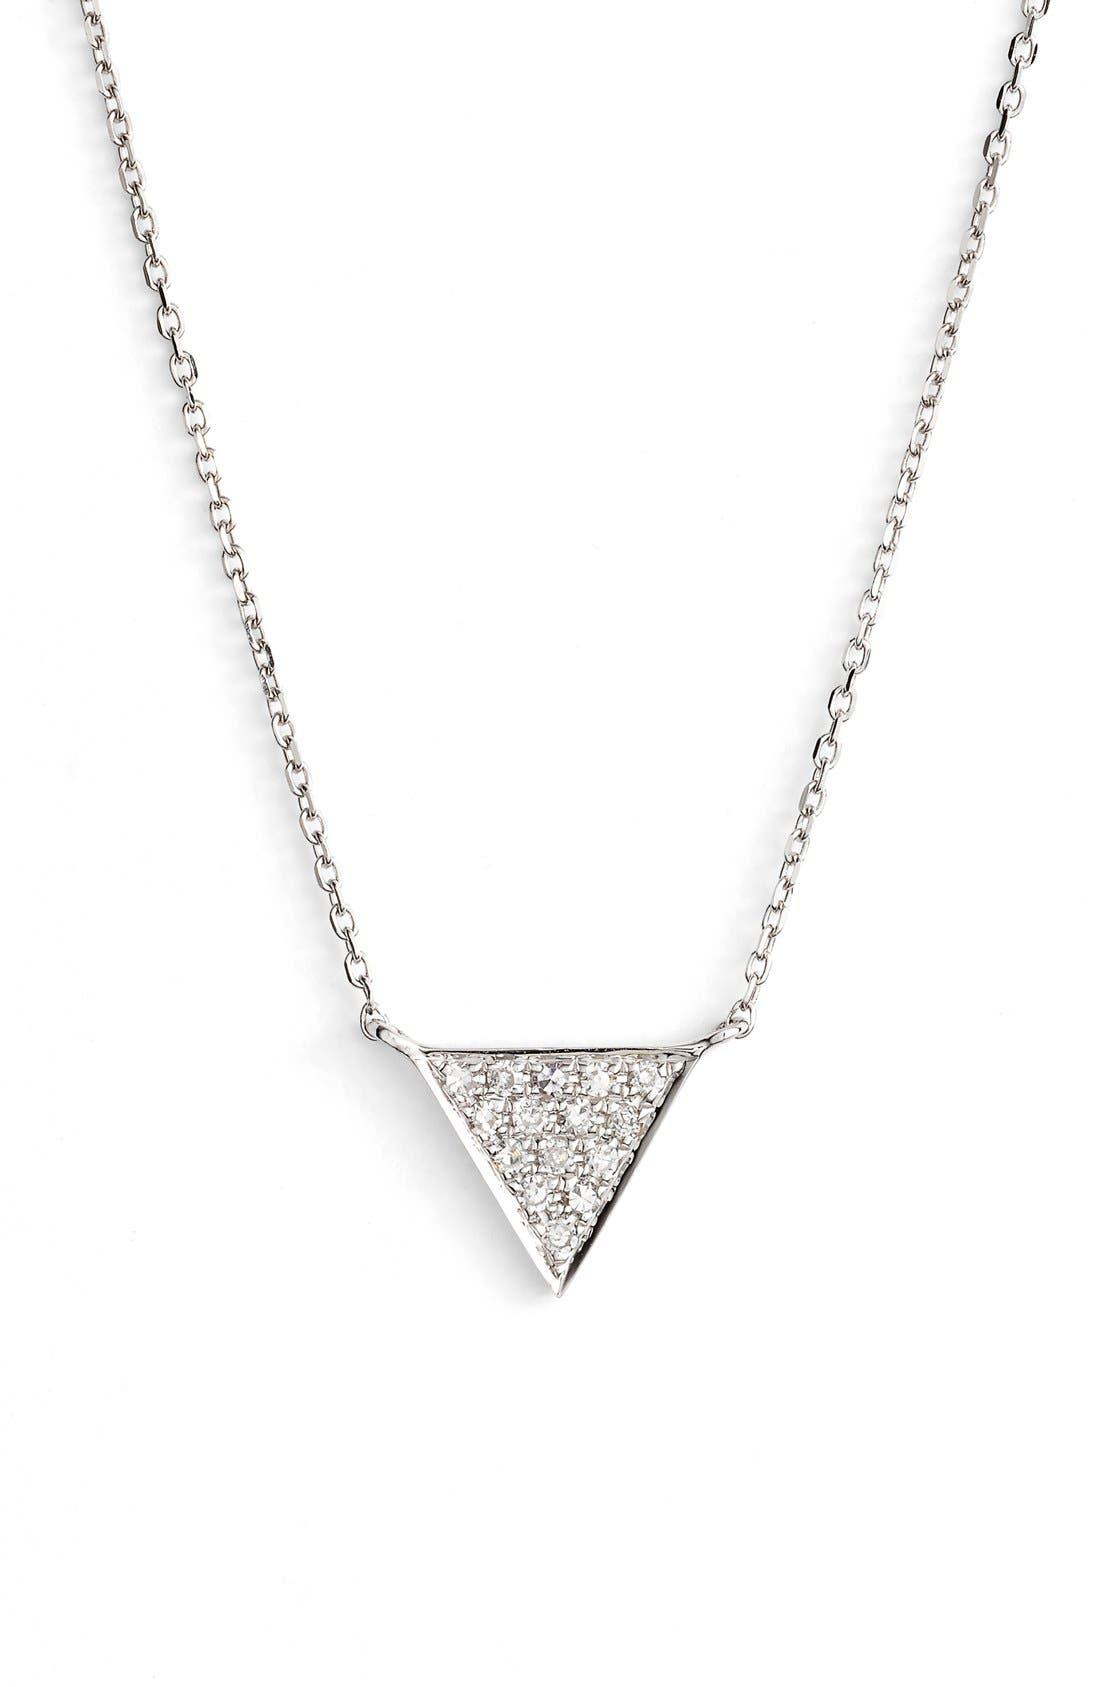 DANA REBECCA DESIGNS 'Emily Sarah' Diamond Triangle Pendant